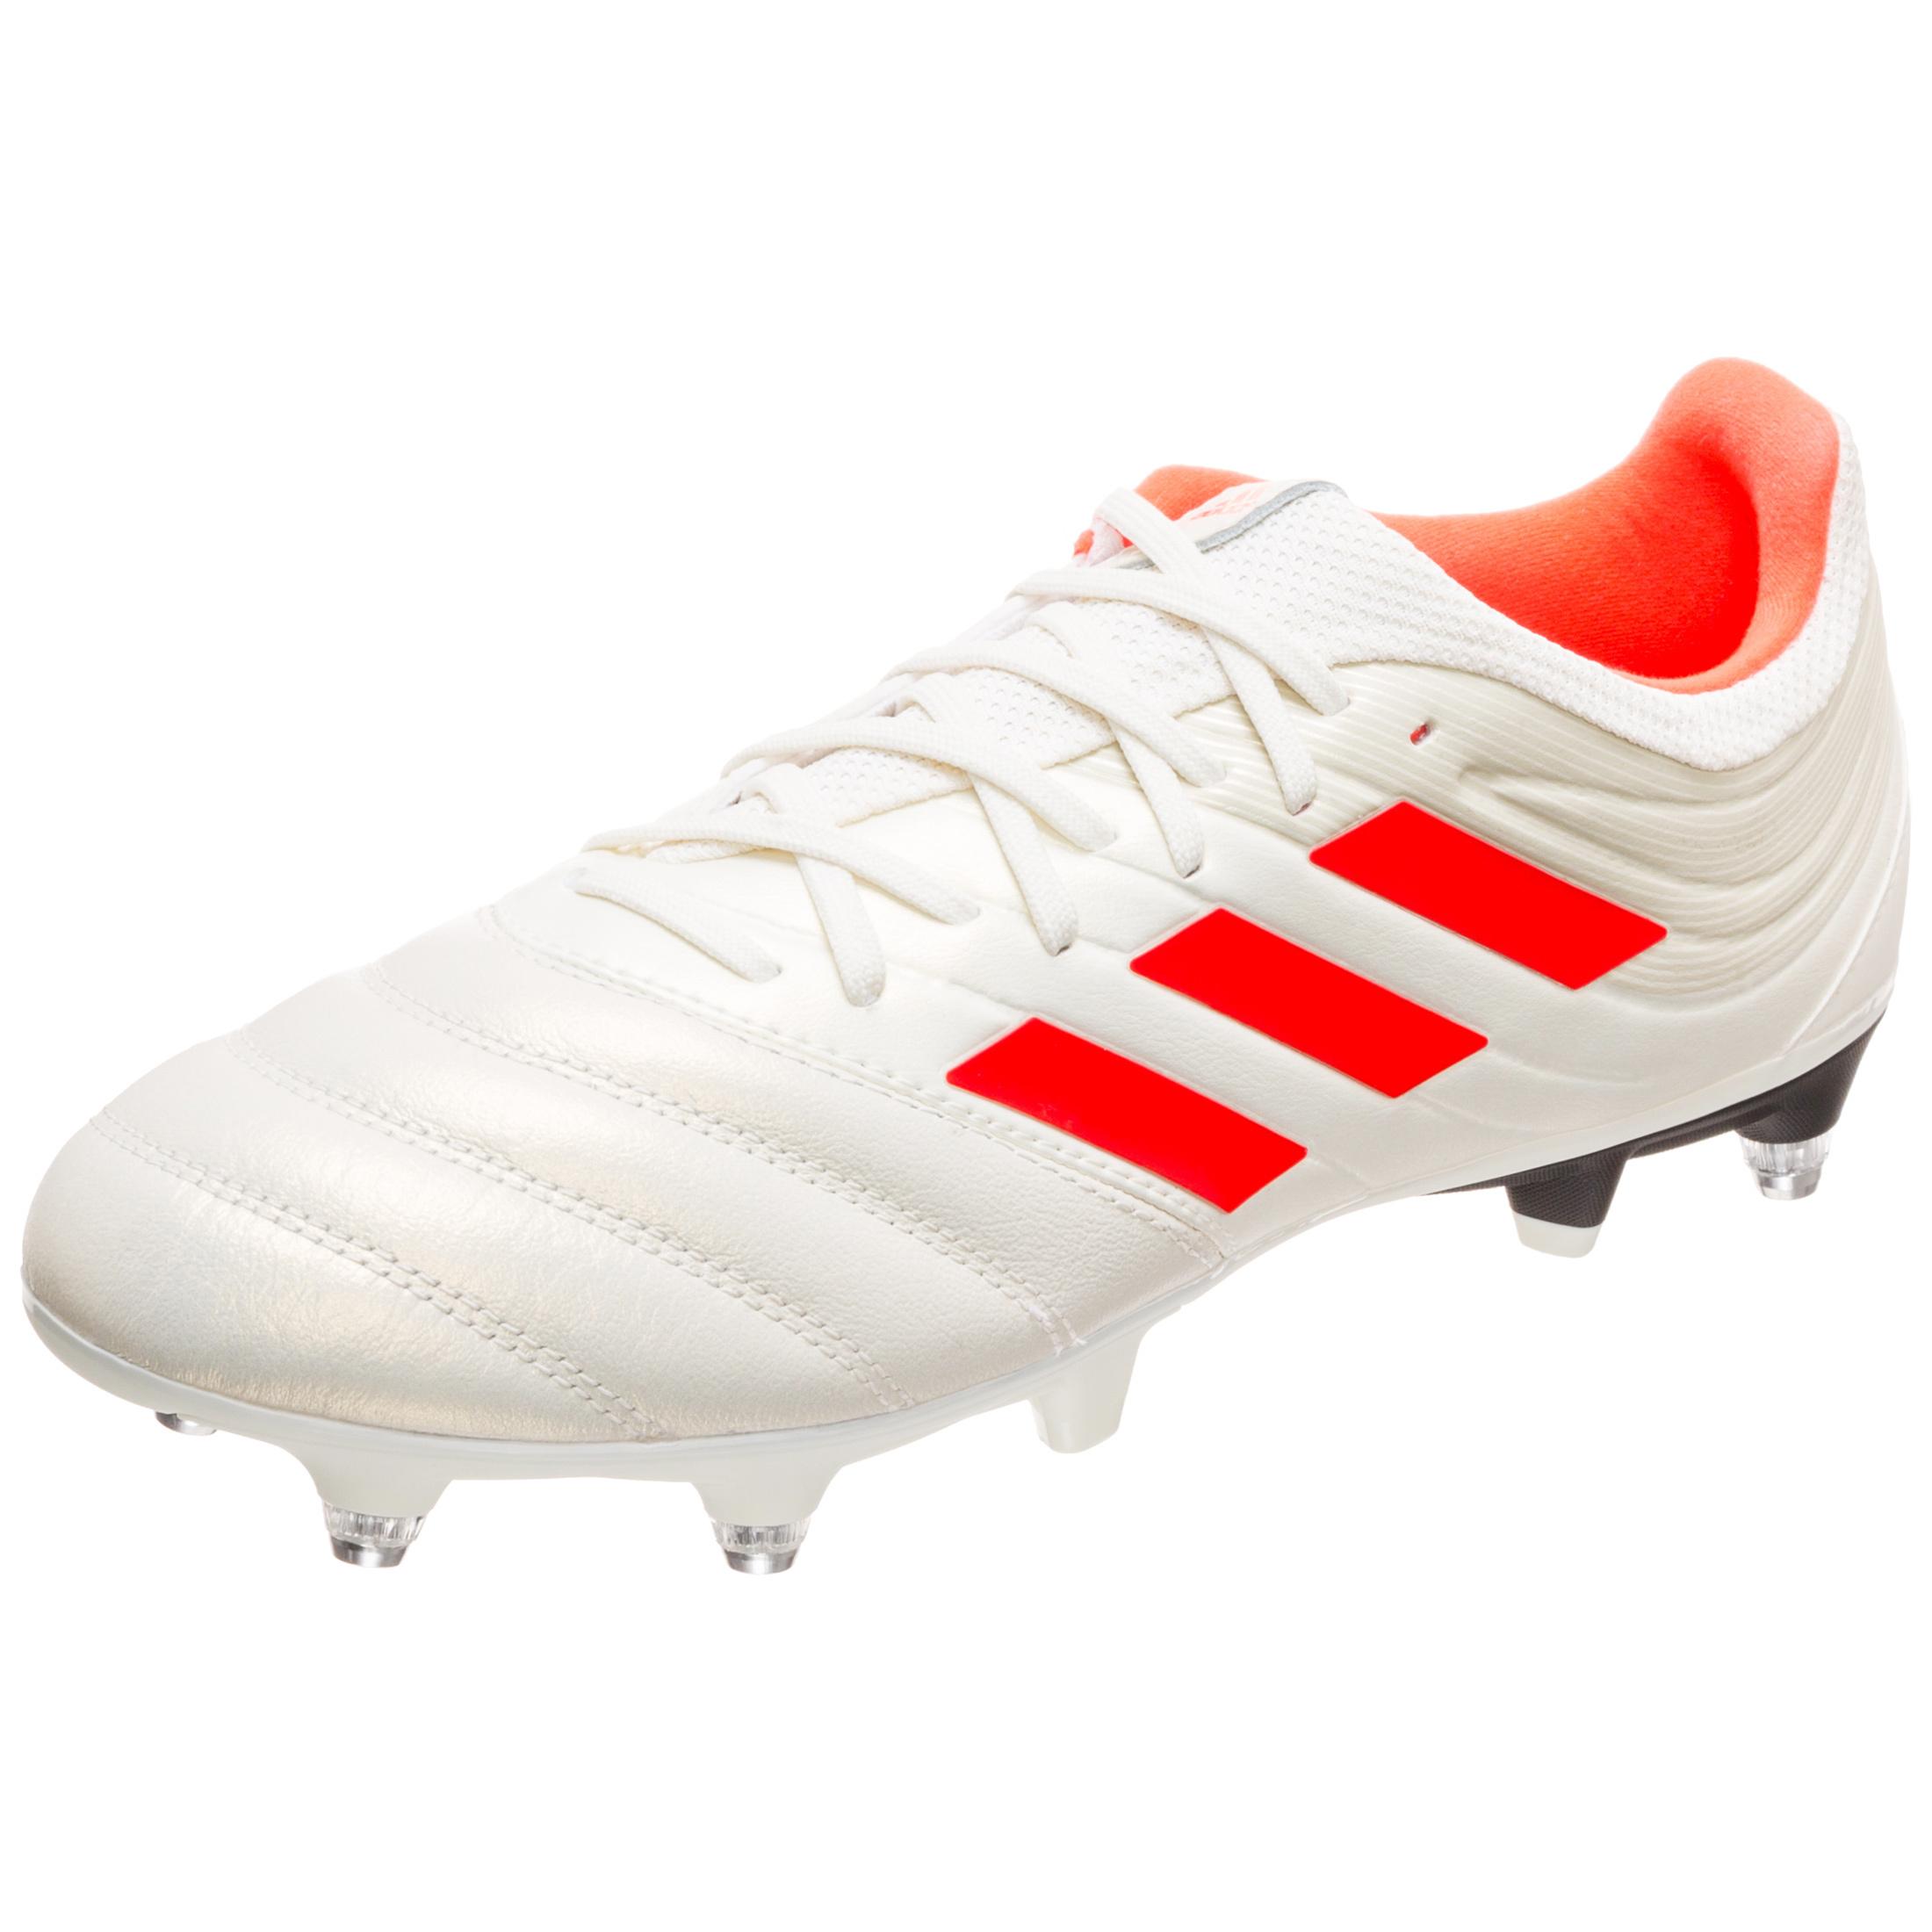 57e8d78ad Soft Ground Football Boots